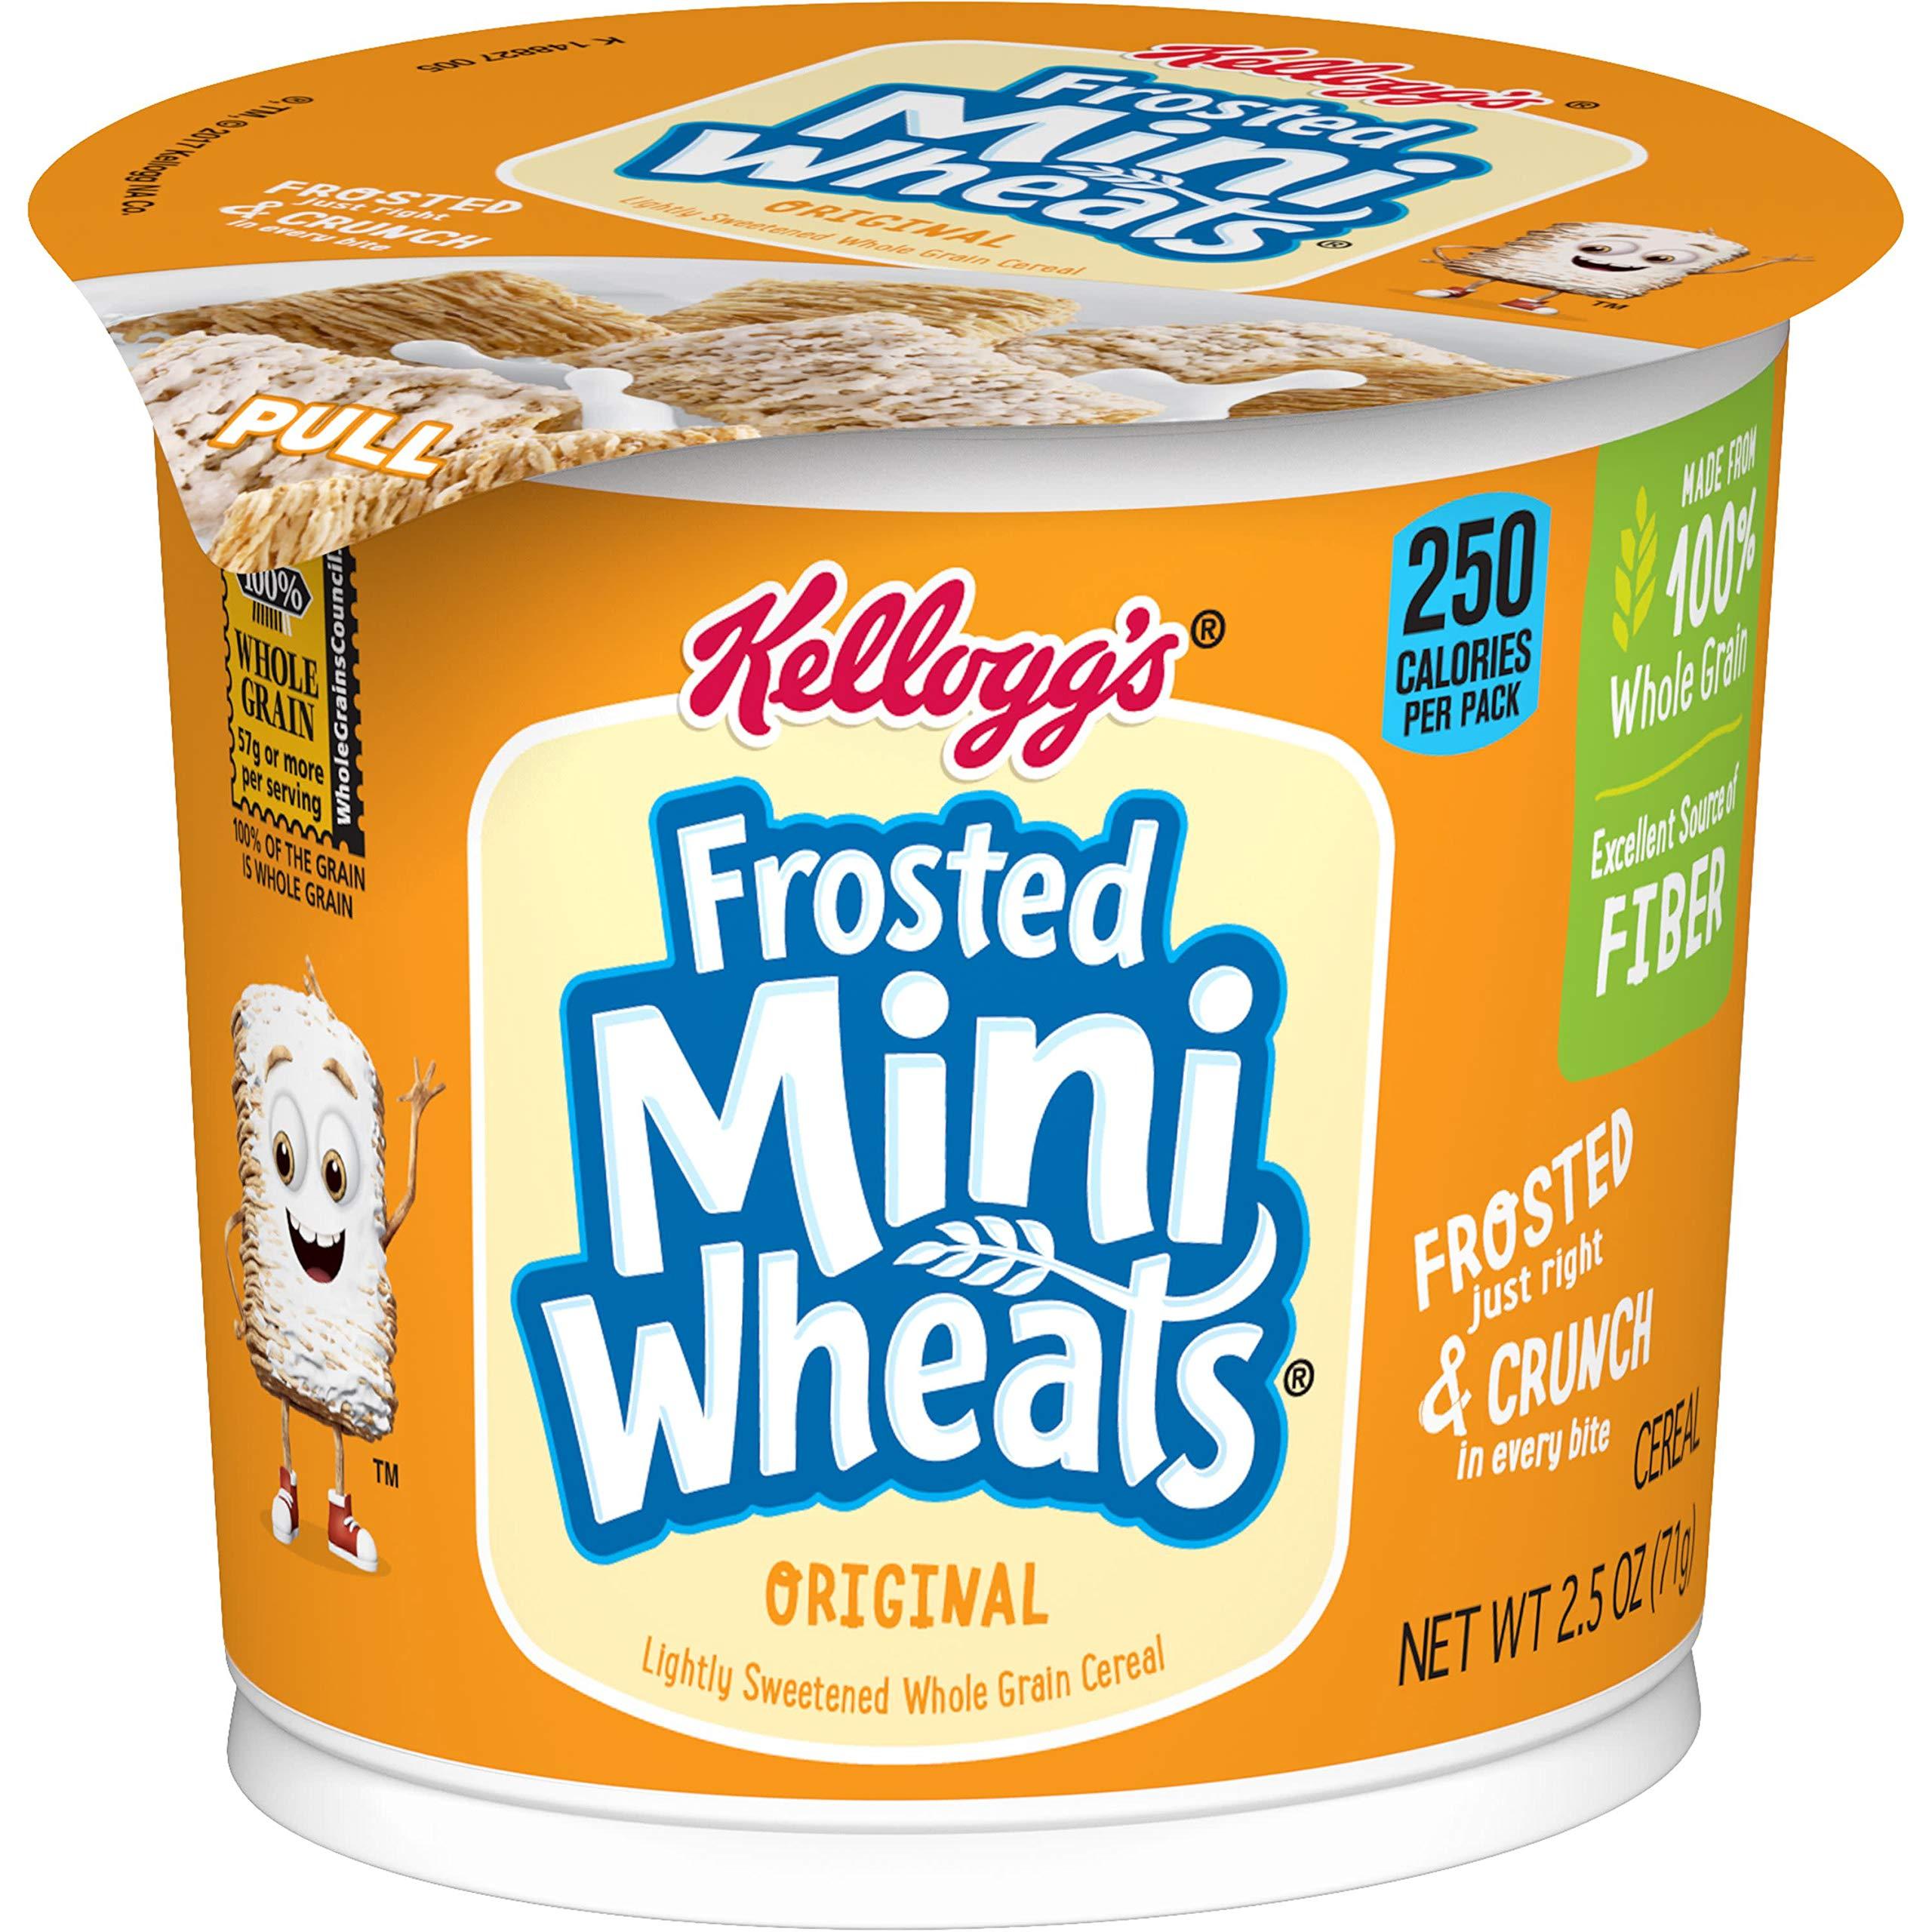 Amazon.com: Kellogg's, Frosted Mini Wheats, Little Bites